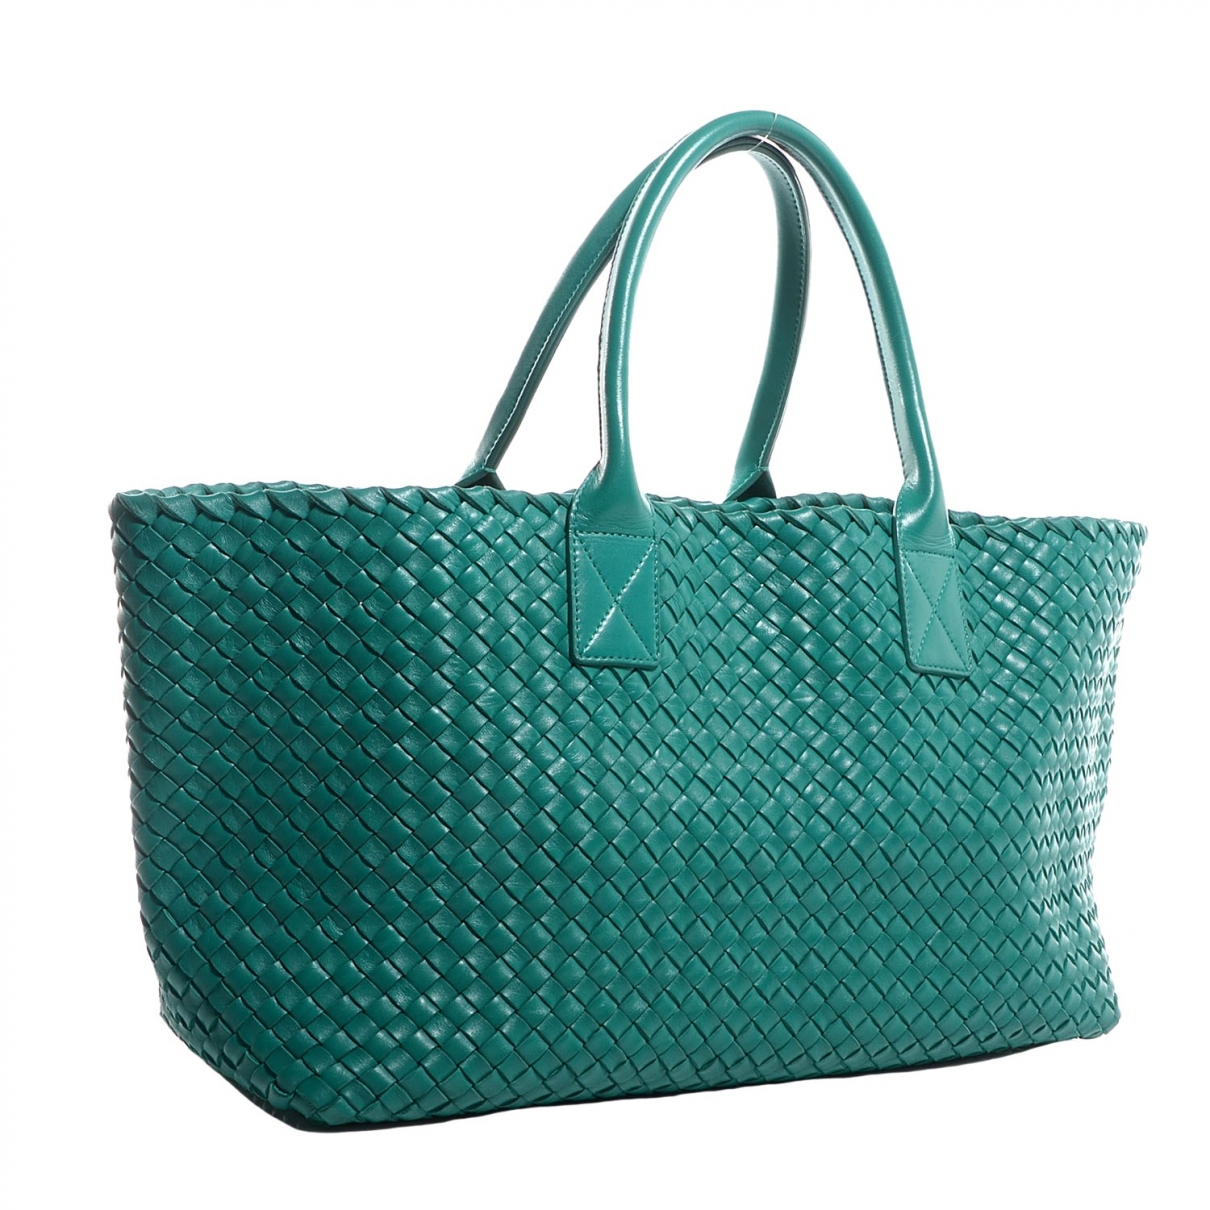 Bottega Veneta Cabat Green Leather handbag for Women \N